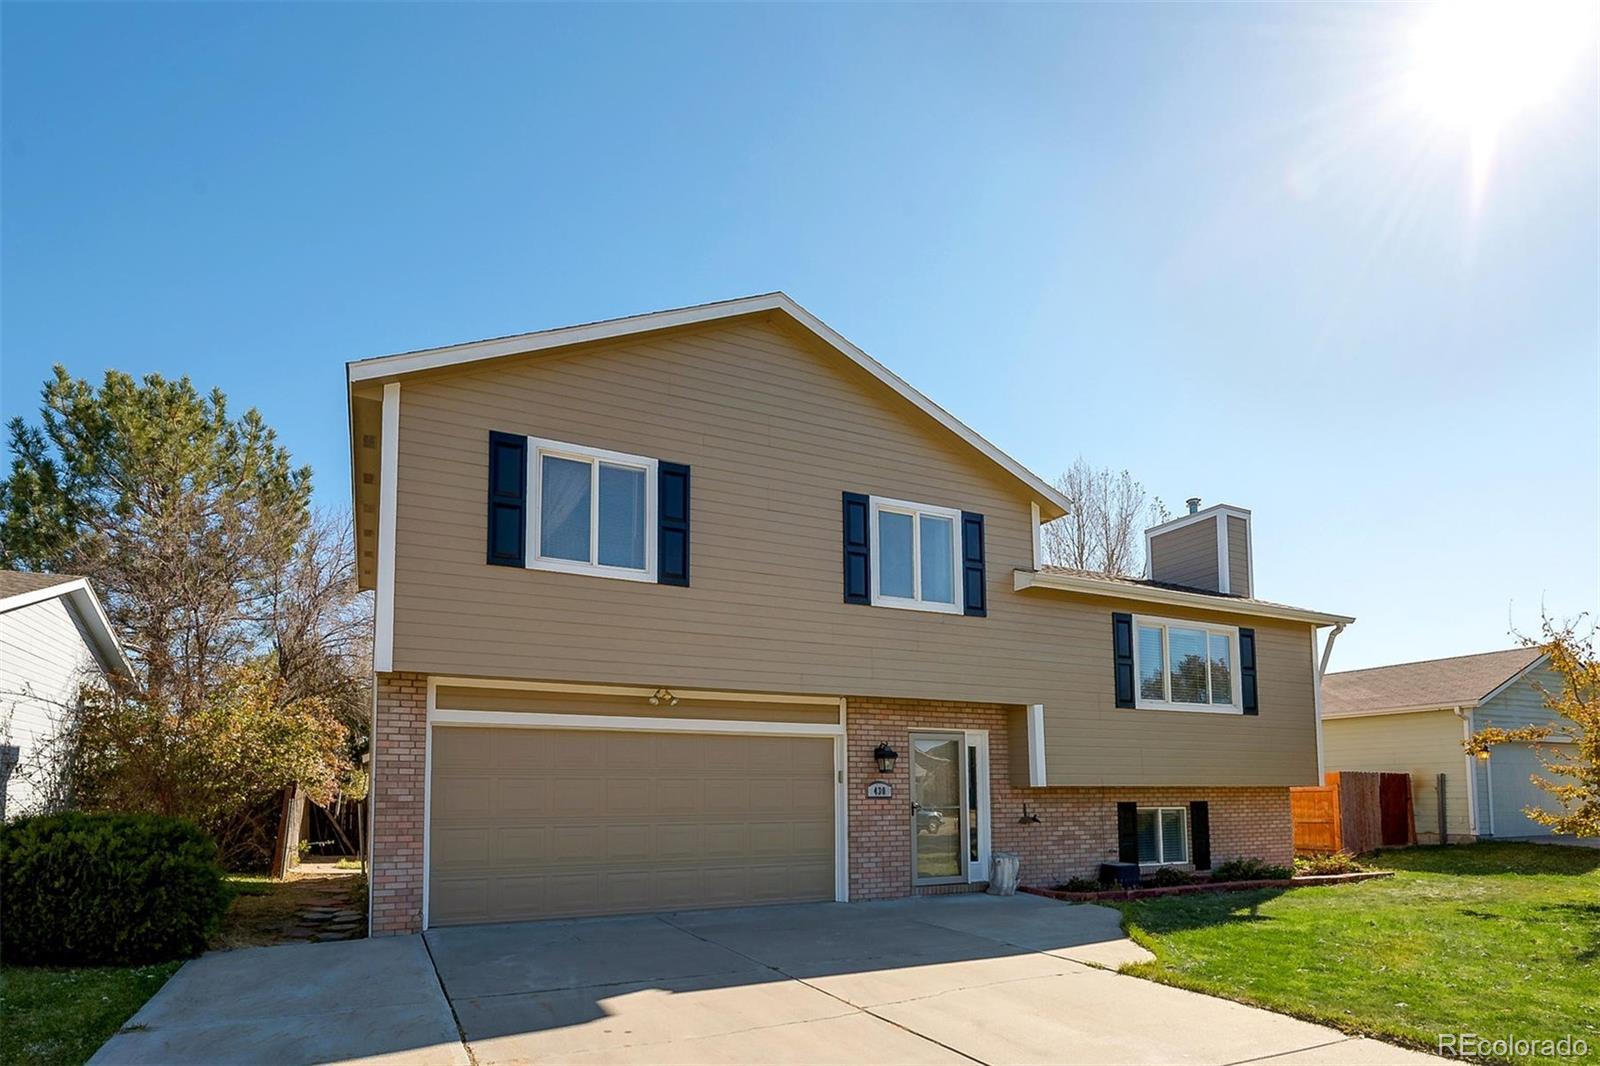 430 Gayle Street, Fort Morgan, CO 80701 - Fort Morgan, CO real estate listing